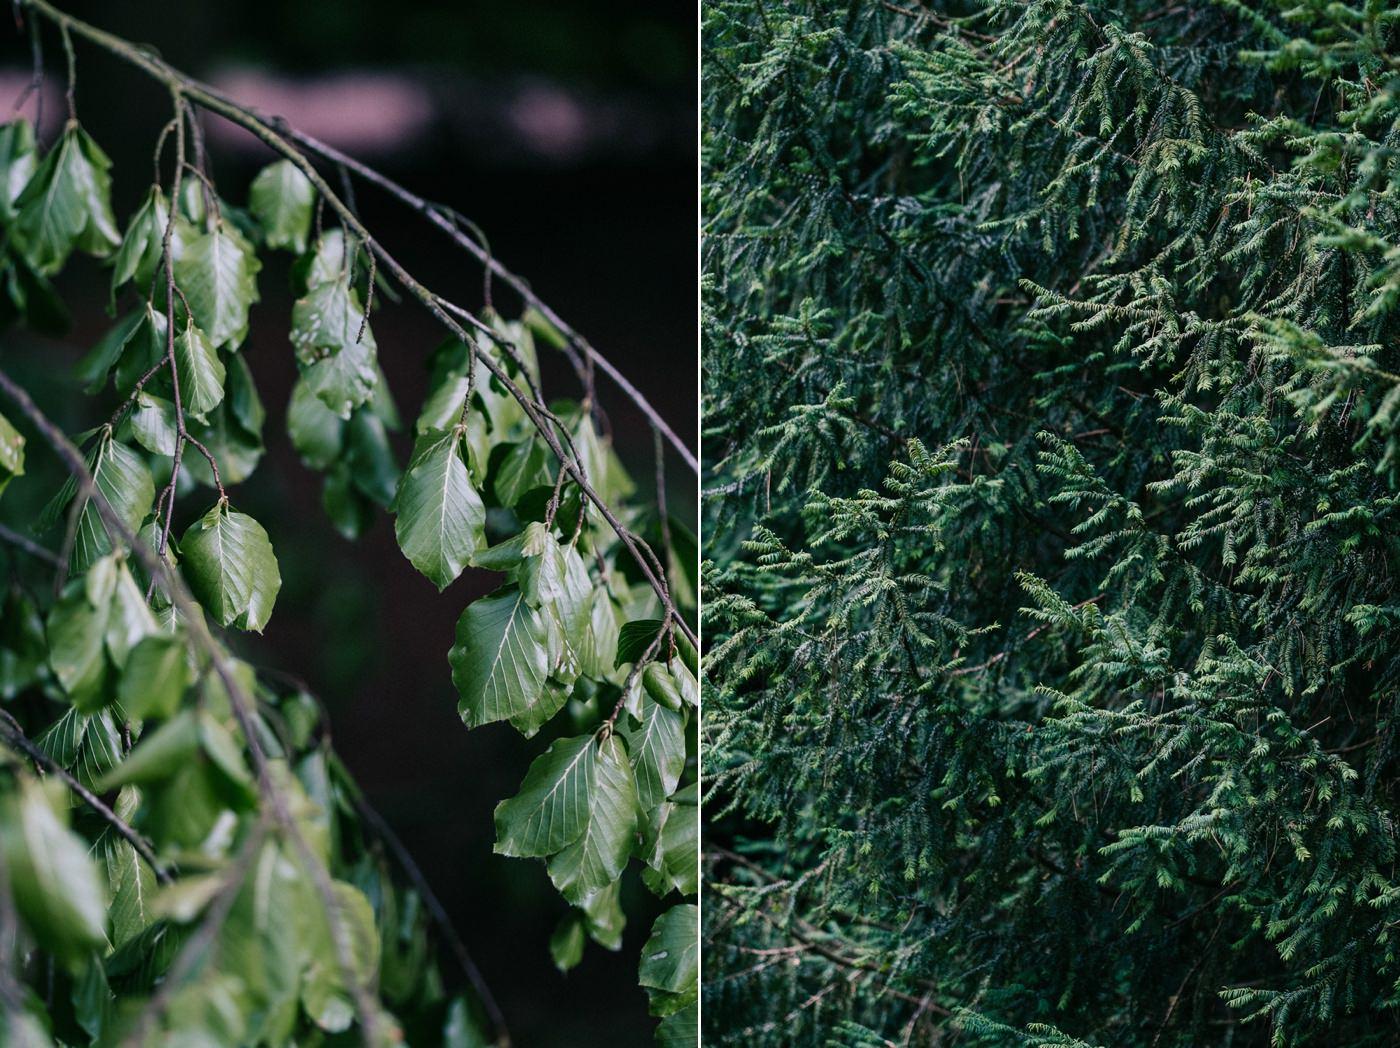 trees at Westonbirt Arboretum